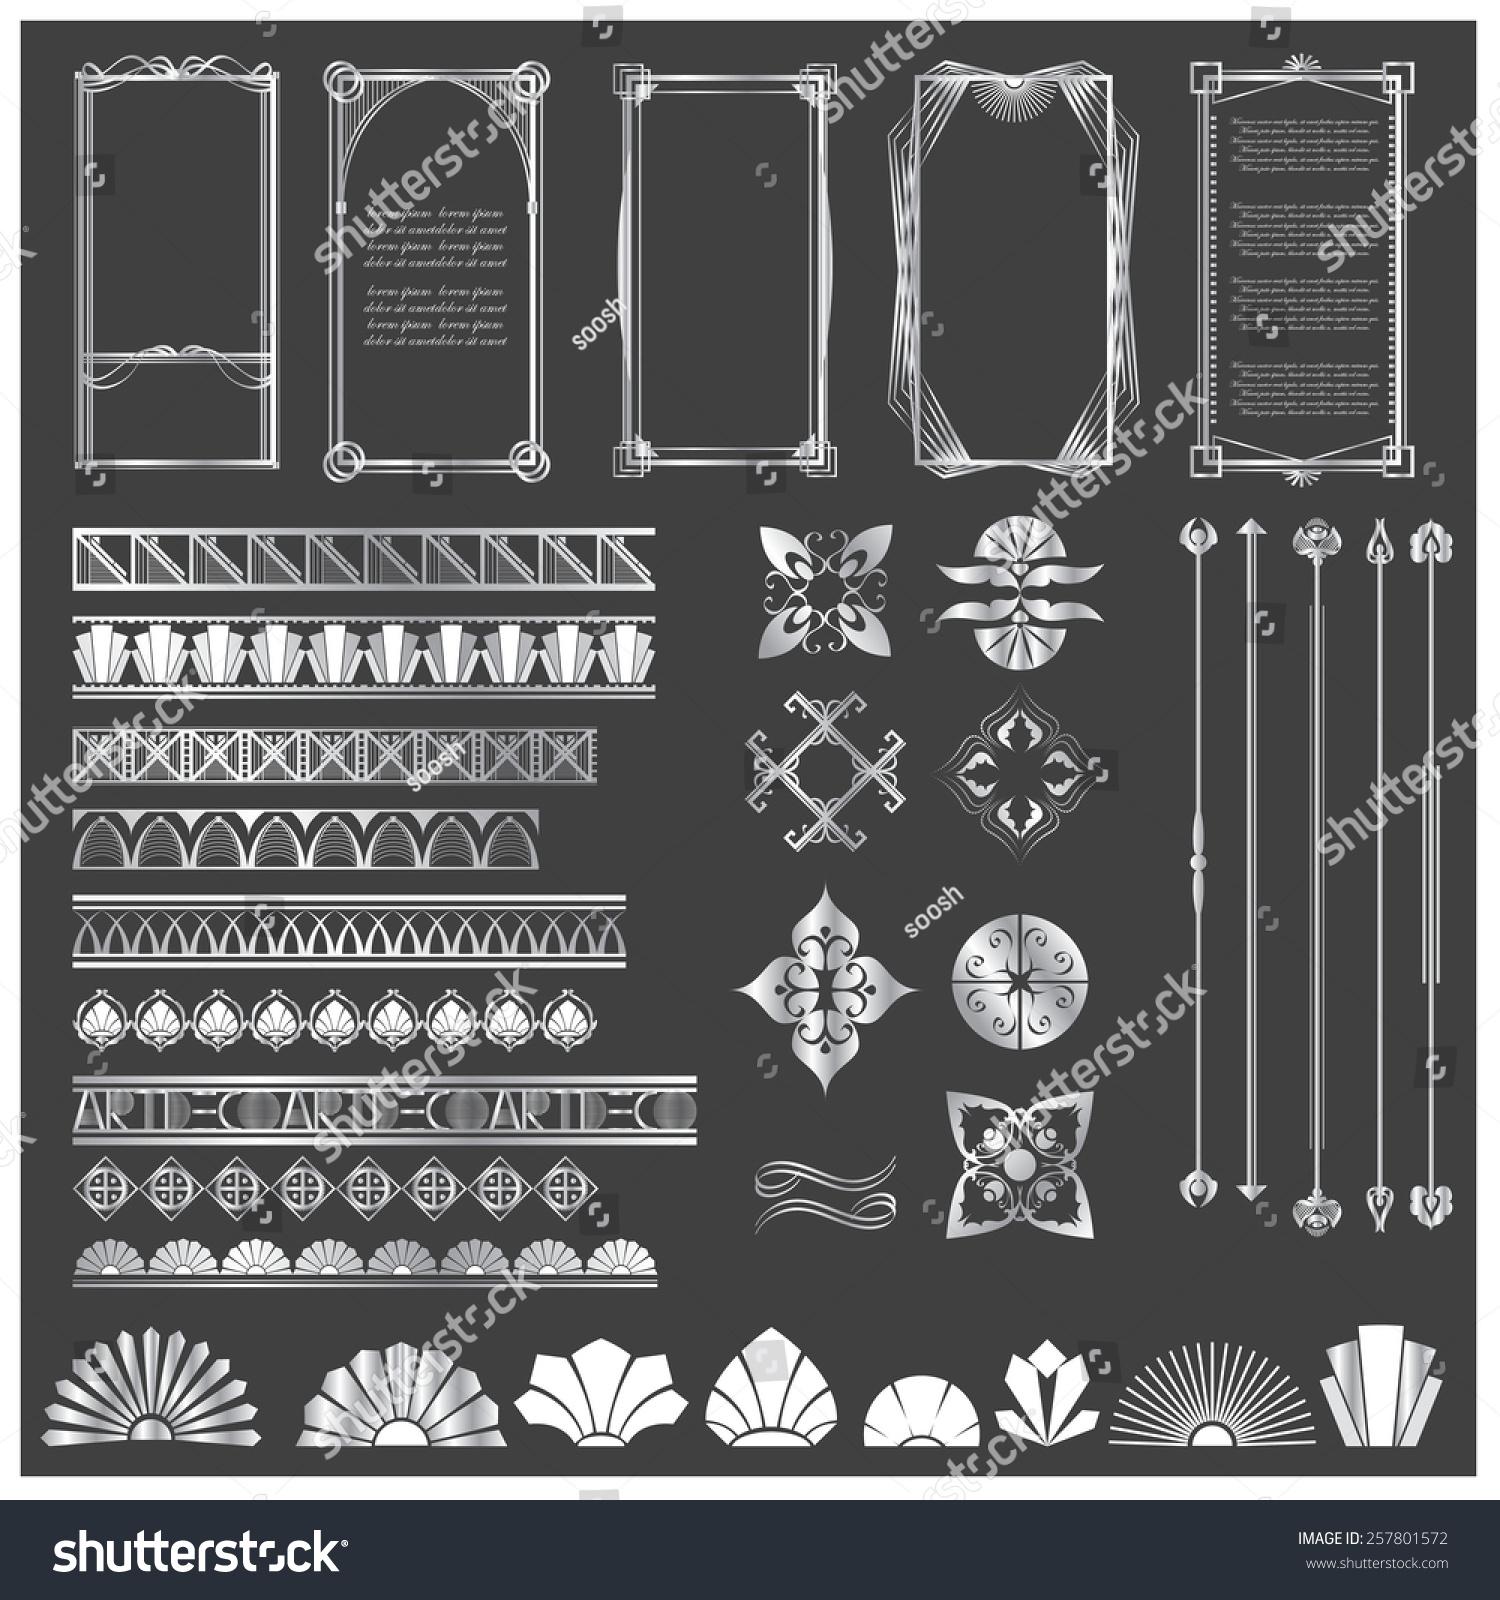 vector illustration set art deco hitech stock vector 257801572 shutterstock. Black Bedroom Furniture Sets. Home Design Ideas